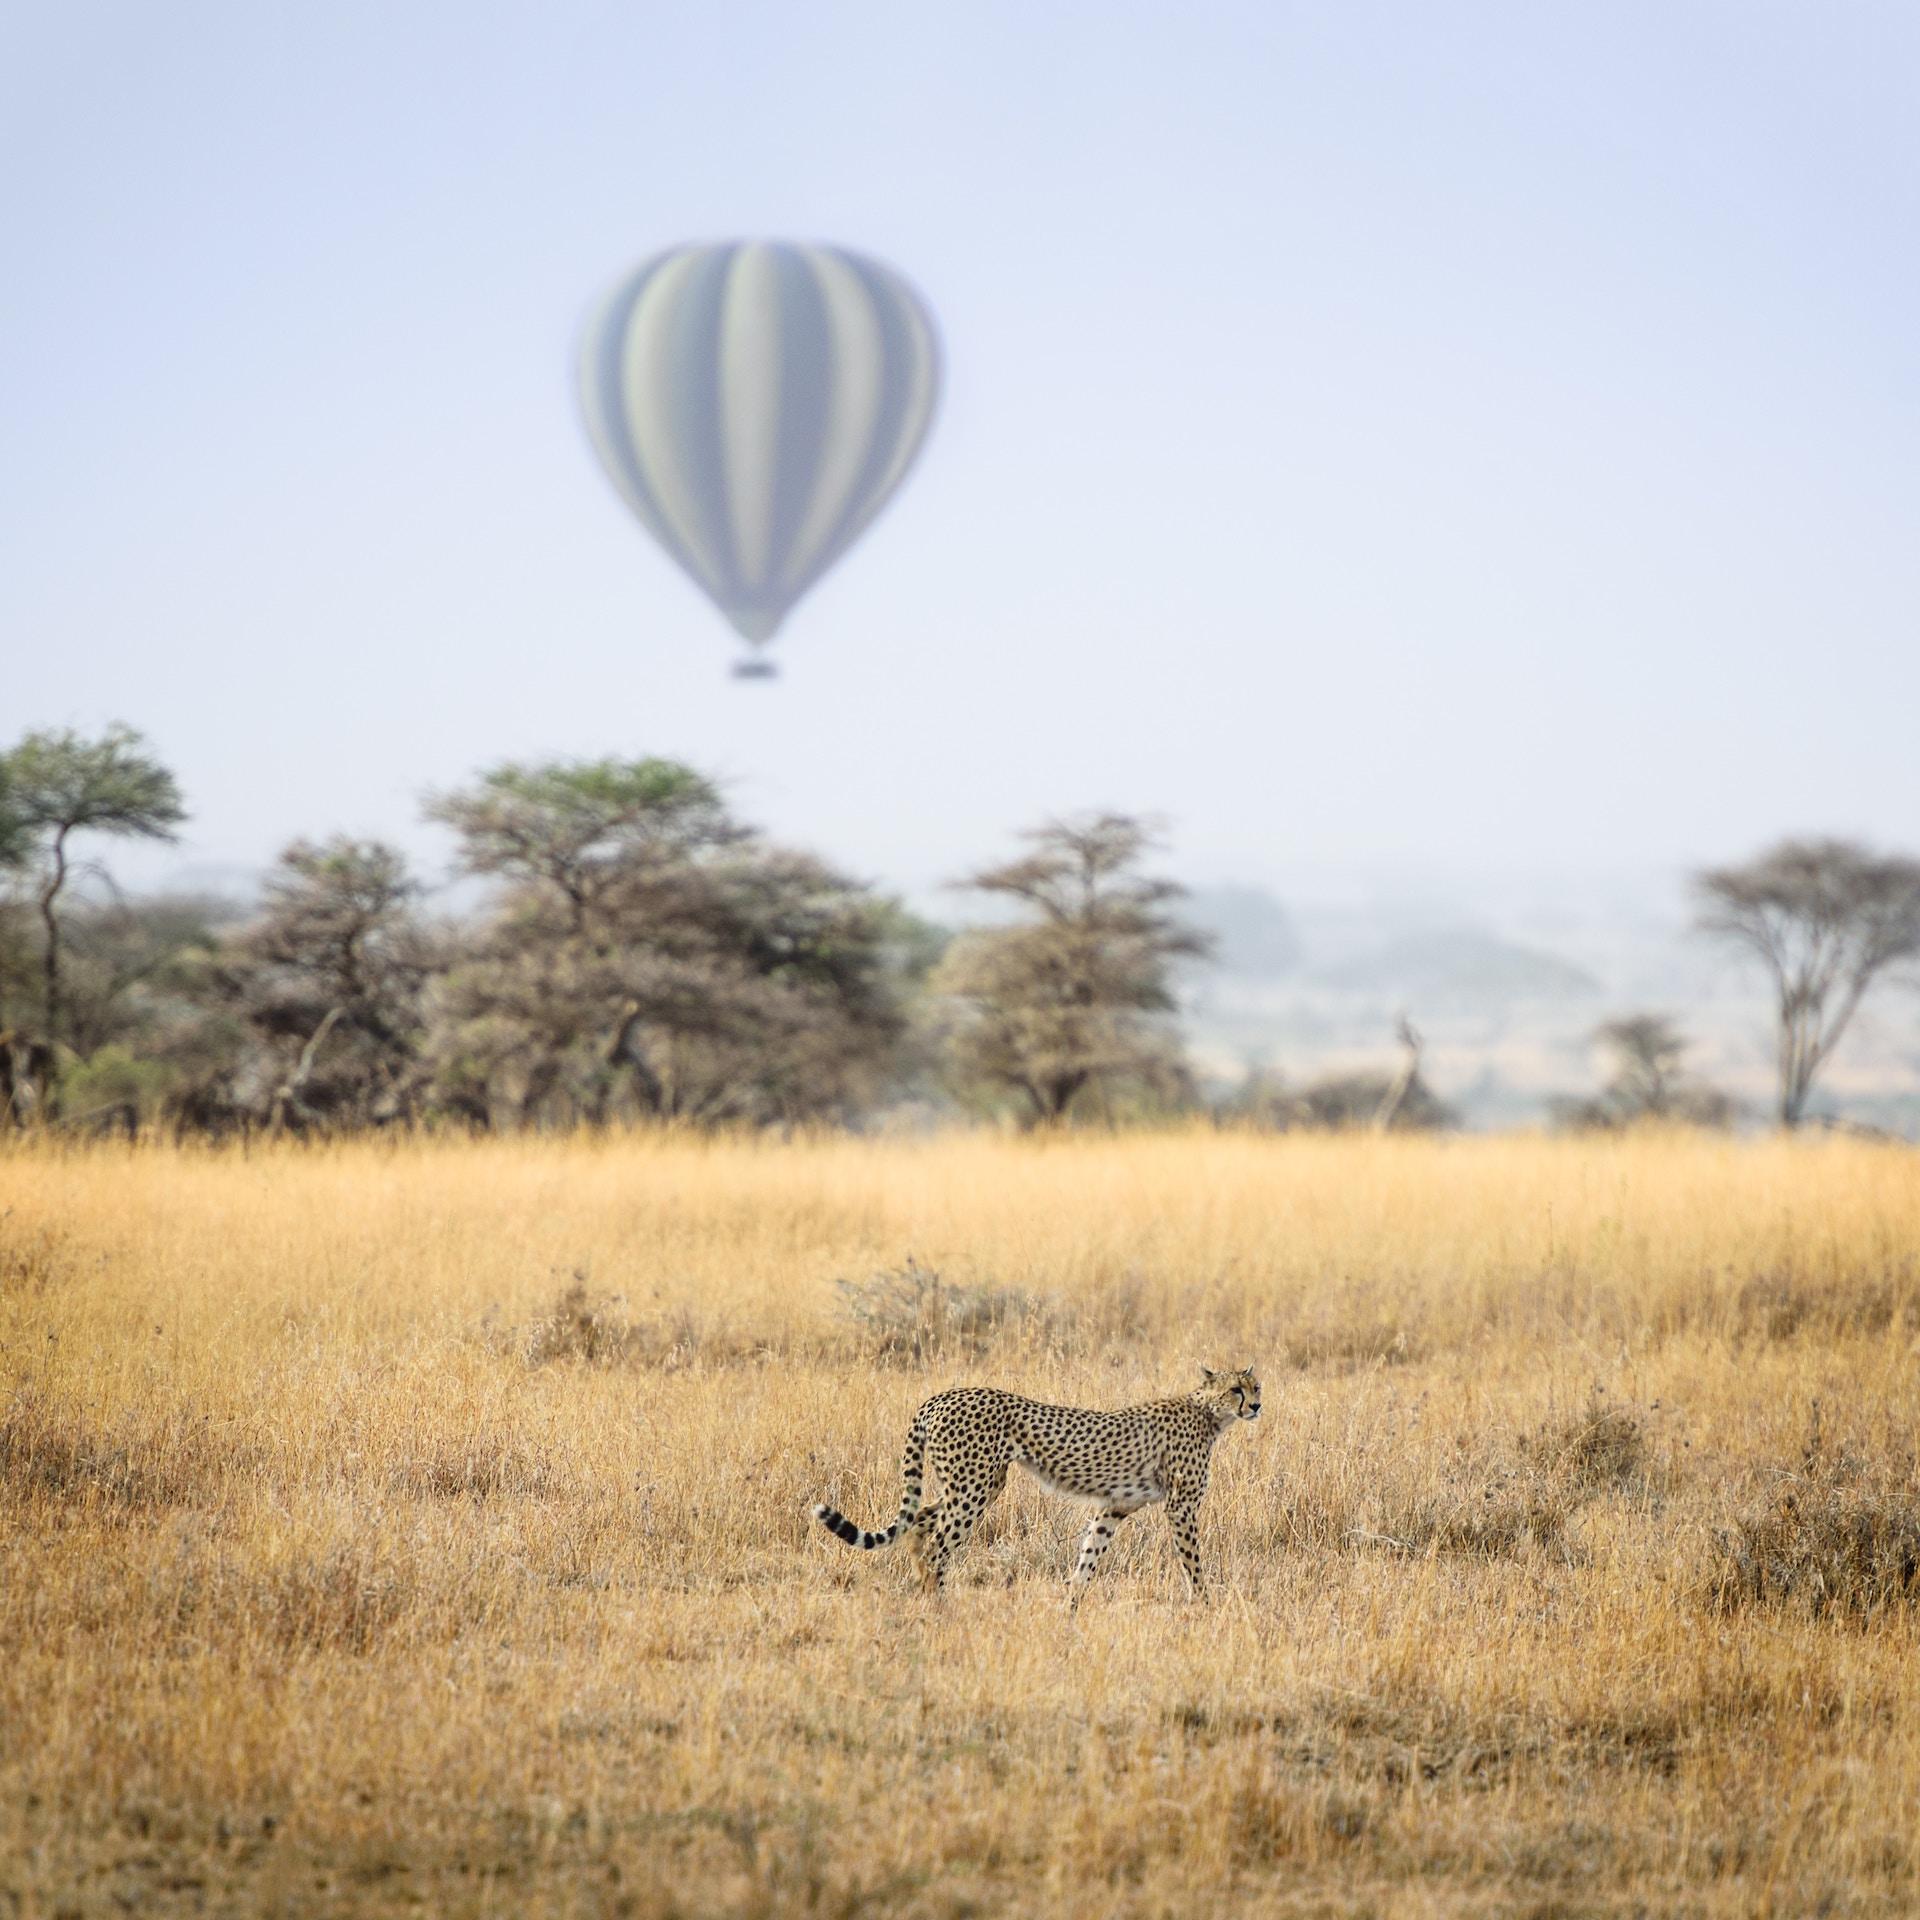 Safari-Travel-Insurance-Tanzania | AardvarkCompare.com